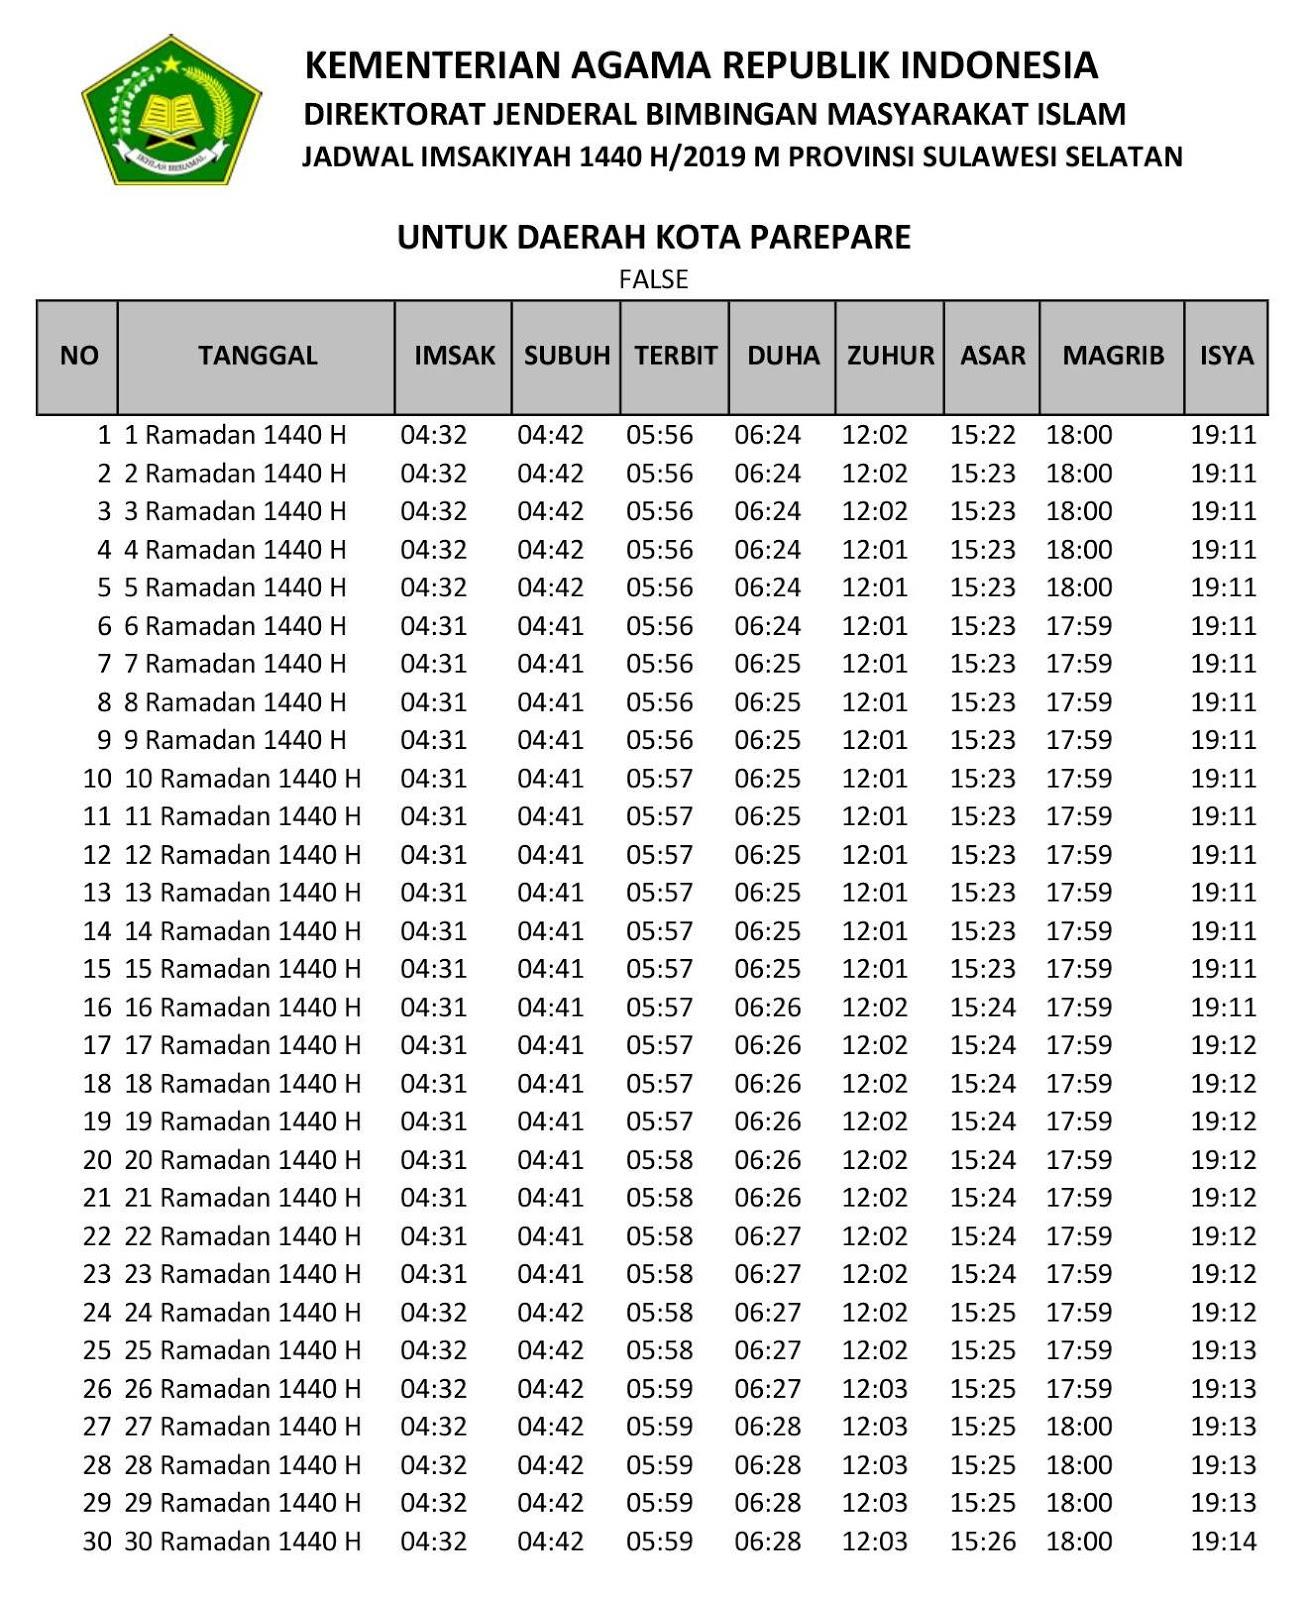 Jadwal Sholat ParePare-Ramadhan 2019-Waktu Maghrib, Waktu Imsak, dan Waktu Shubuh di Wilayah Kota Pare Pare dan Sekitarnya, Sulawesi Selatan-Bulan Puasa 2019-1440 Hijriyah.